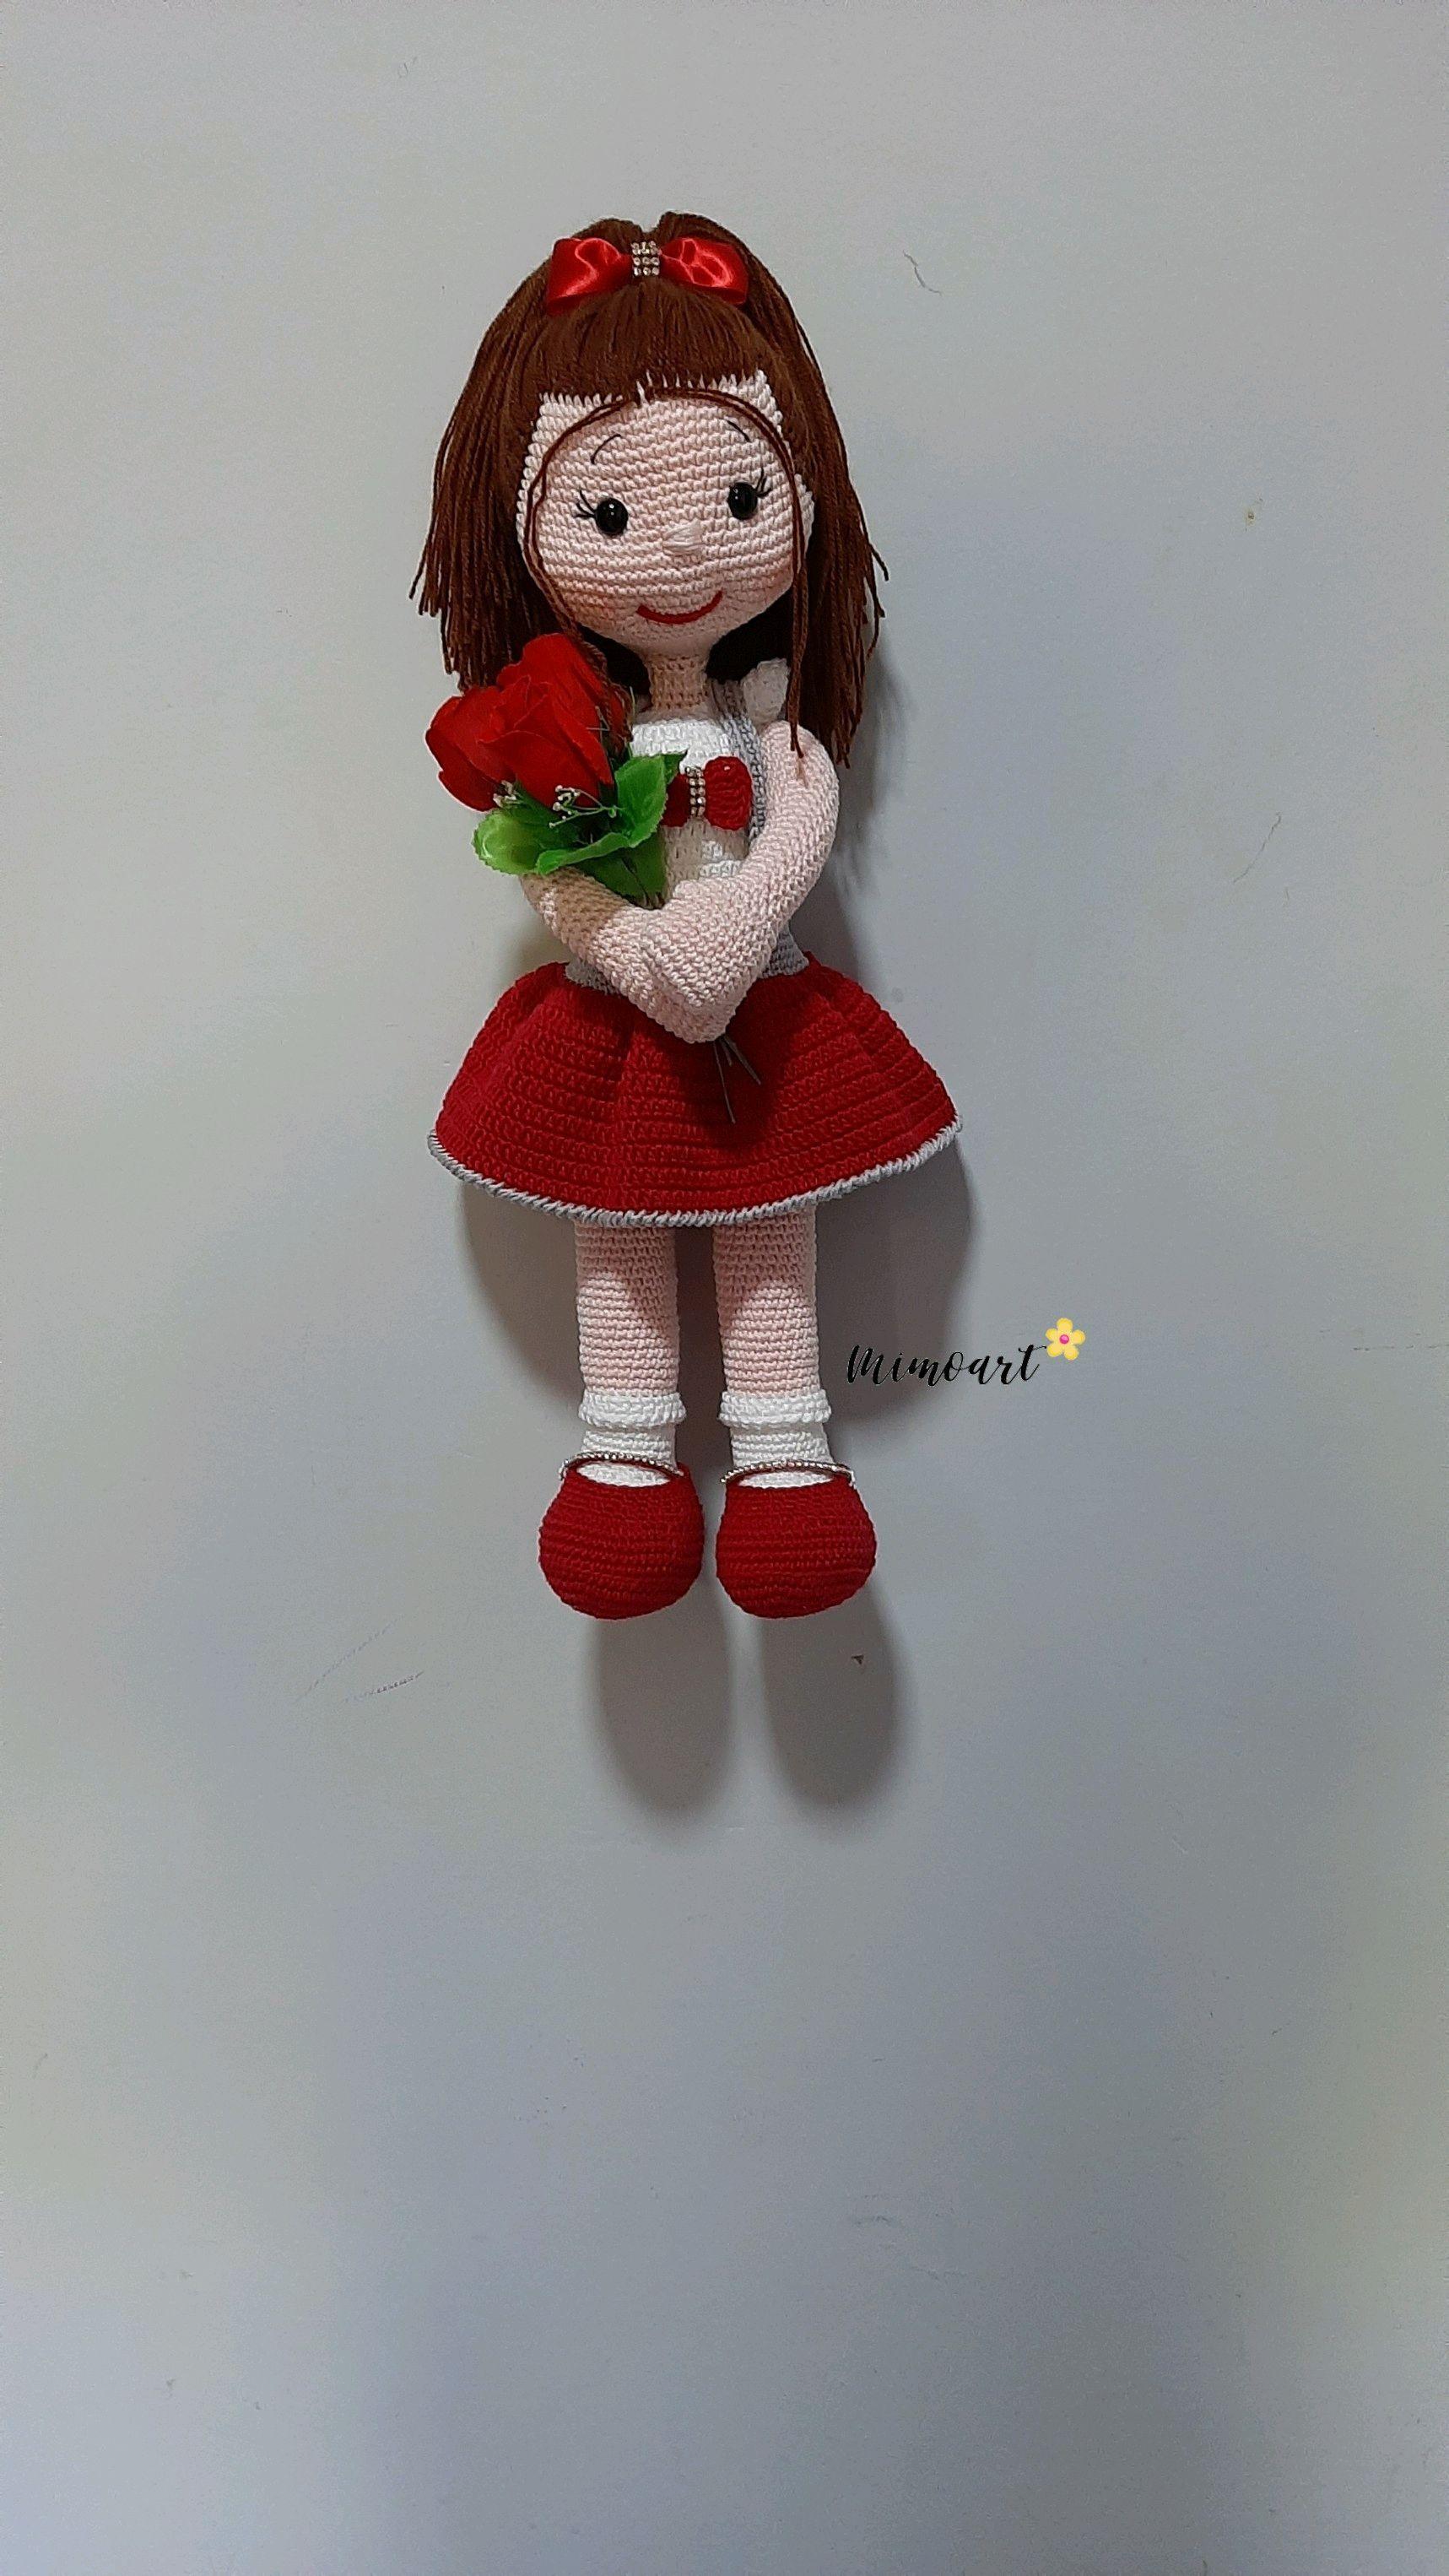 Bonecas Russas | Bonecas, Boneca russa, Bonecas de tricô | 3052x1717